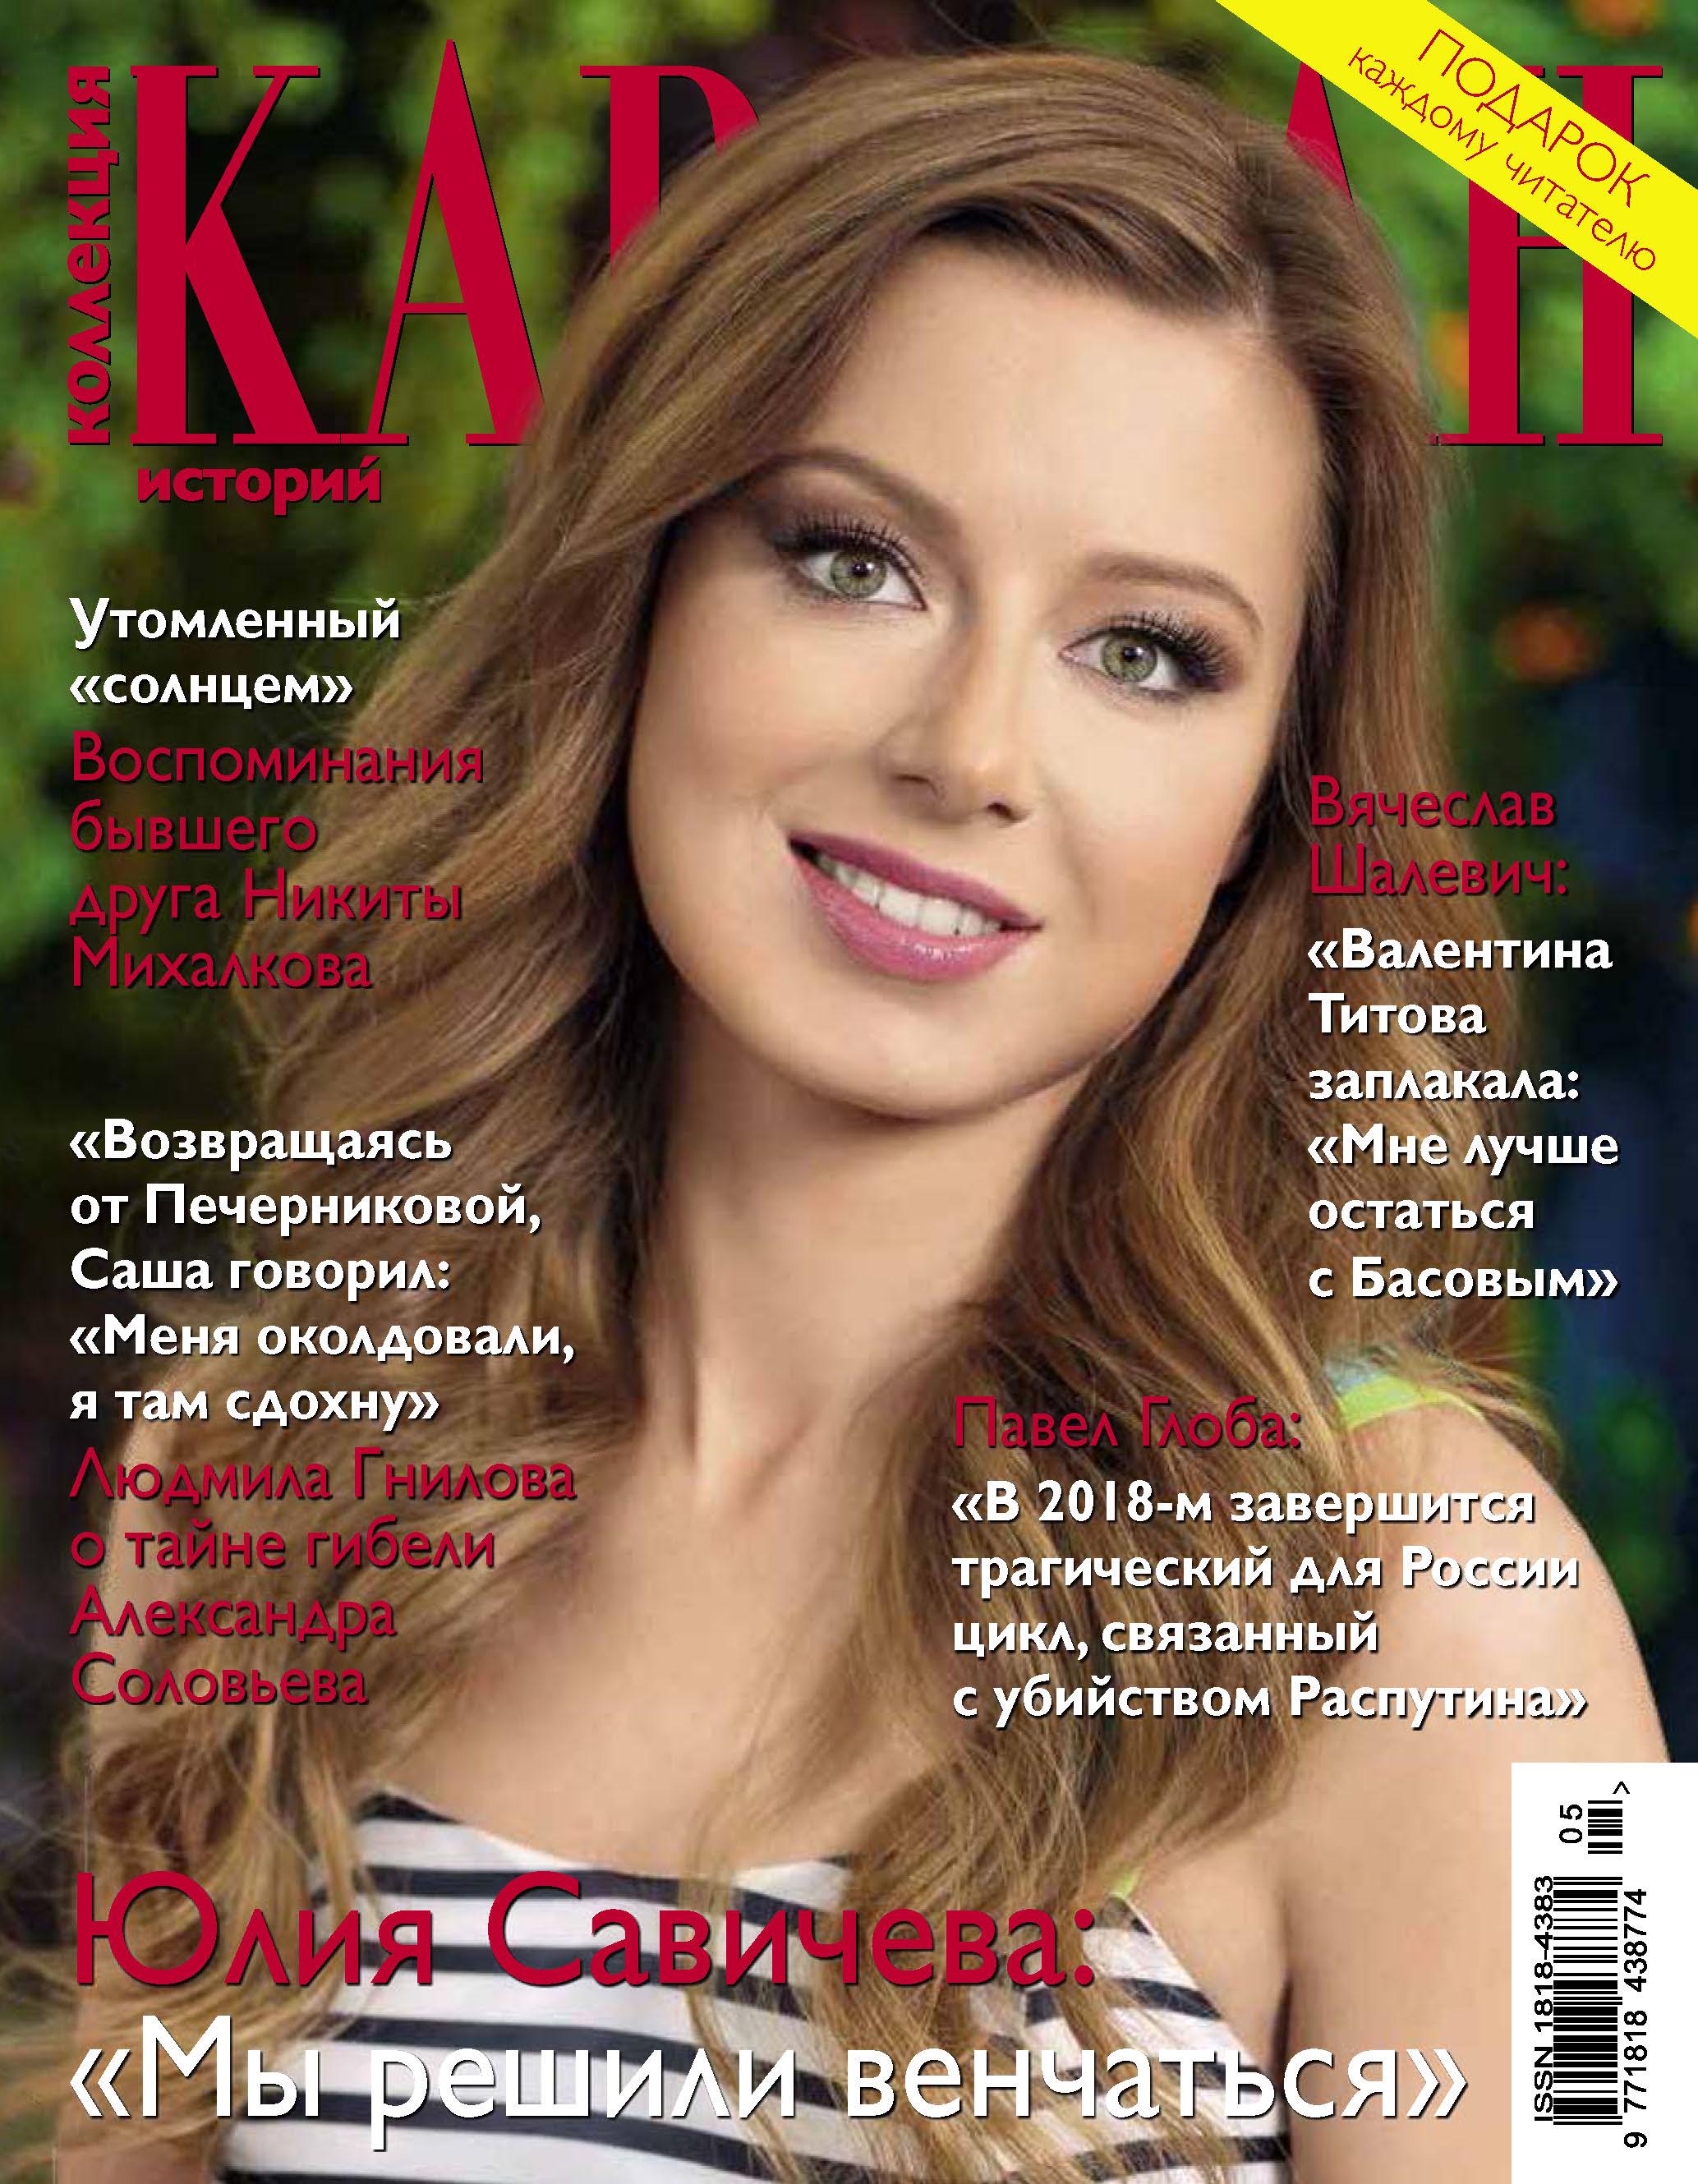 Коллекция Караван историй №05 / май 2014